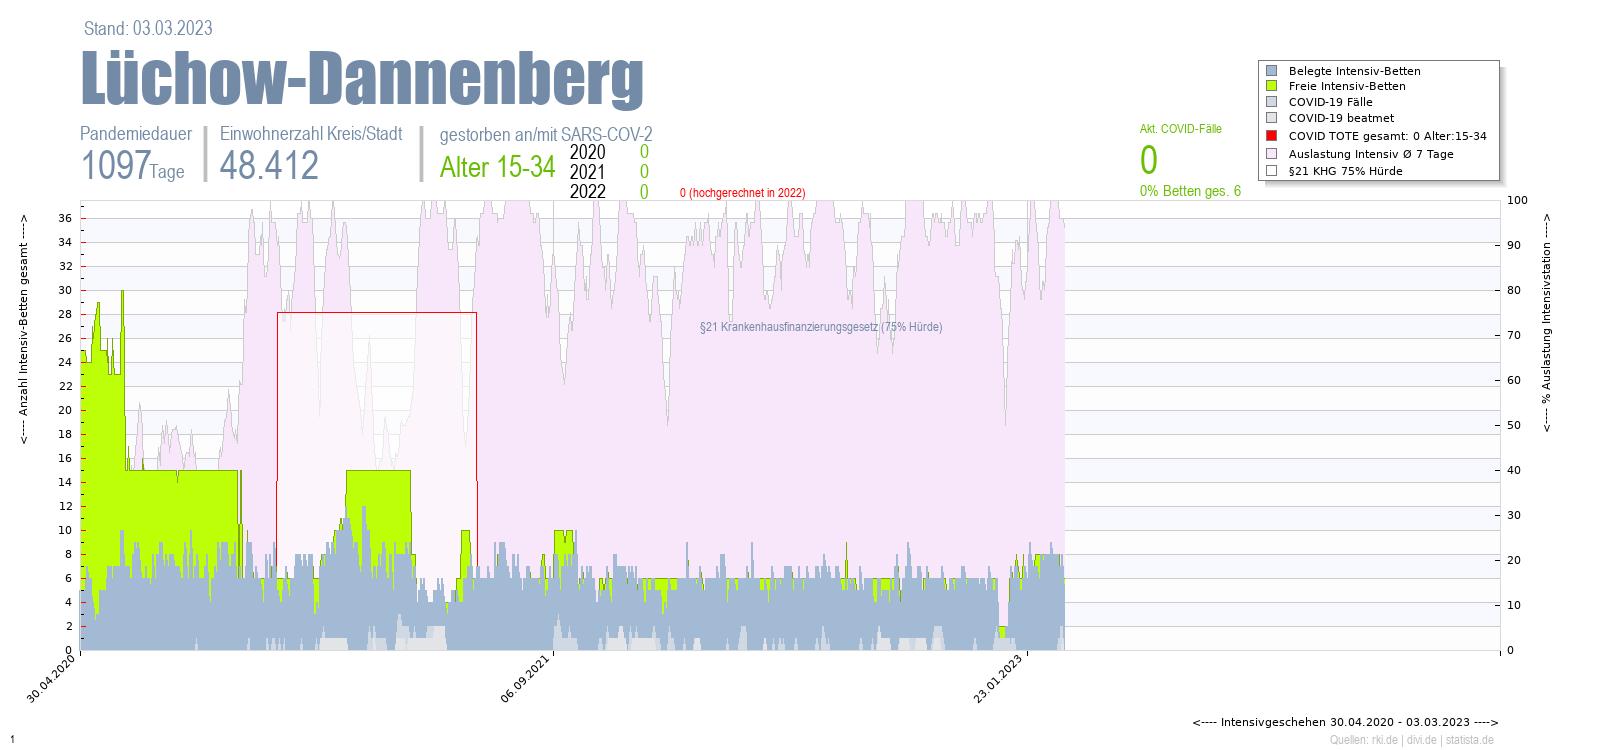 Intensivstation Auslastung Lüchow-Dannenberg Alter 0-4